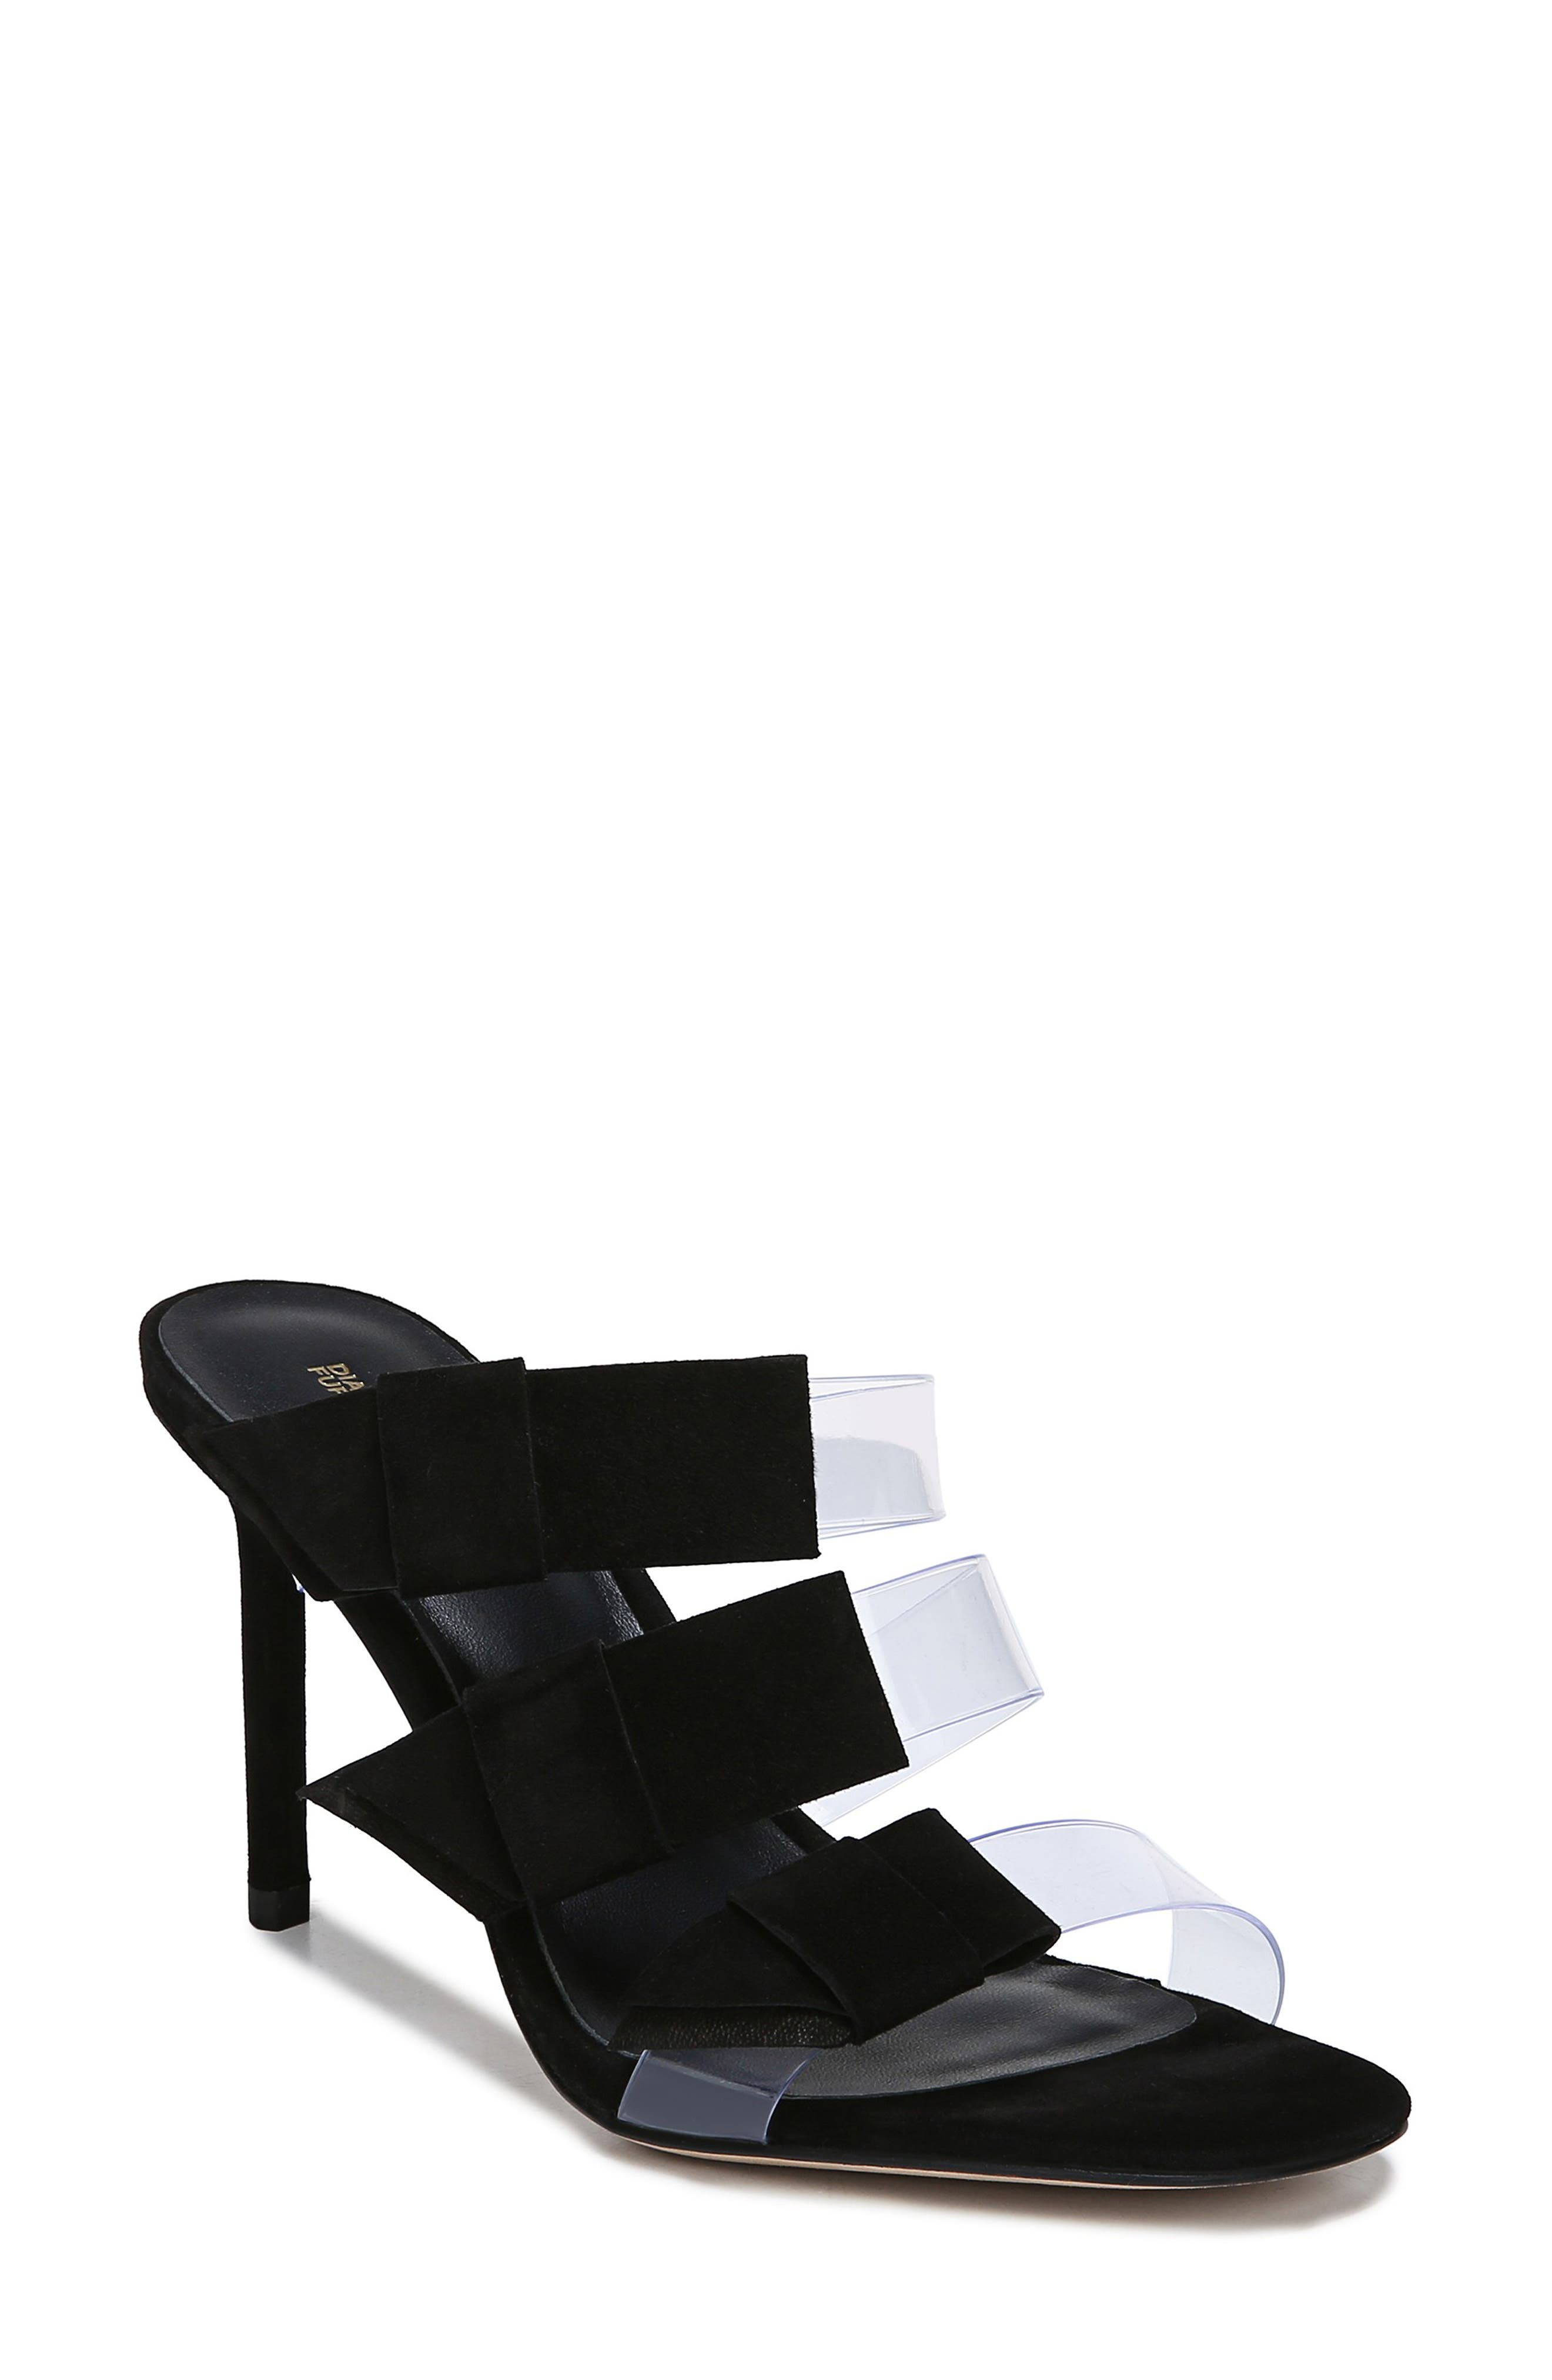 Amari Triple Strap Sandal, Main, color, BLACK